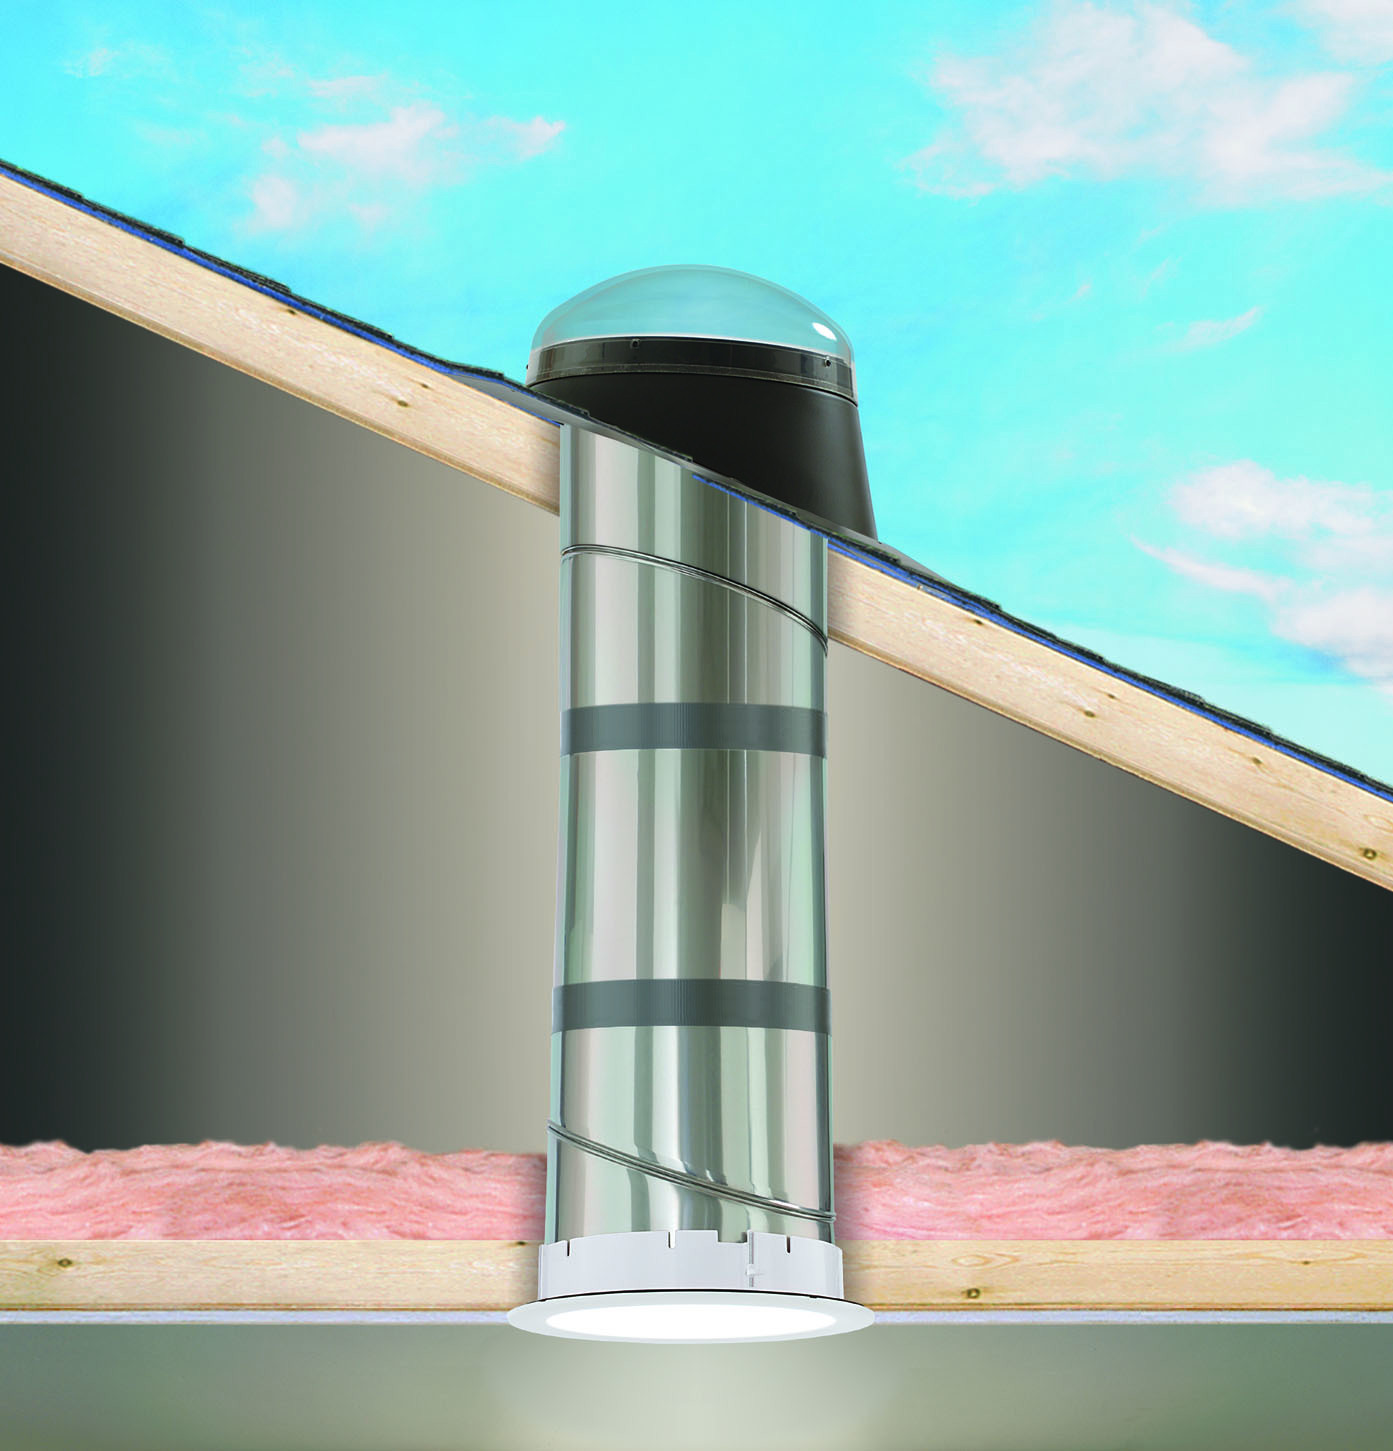 Sun-Tunnel-skylight-cutaway.jpg#asset:5986